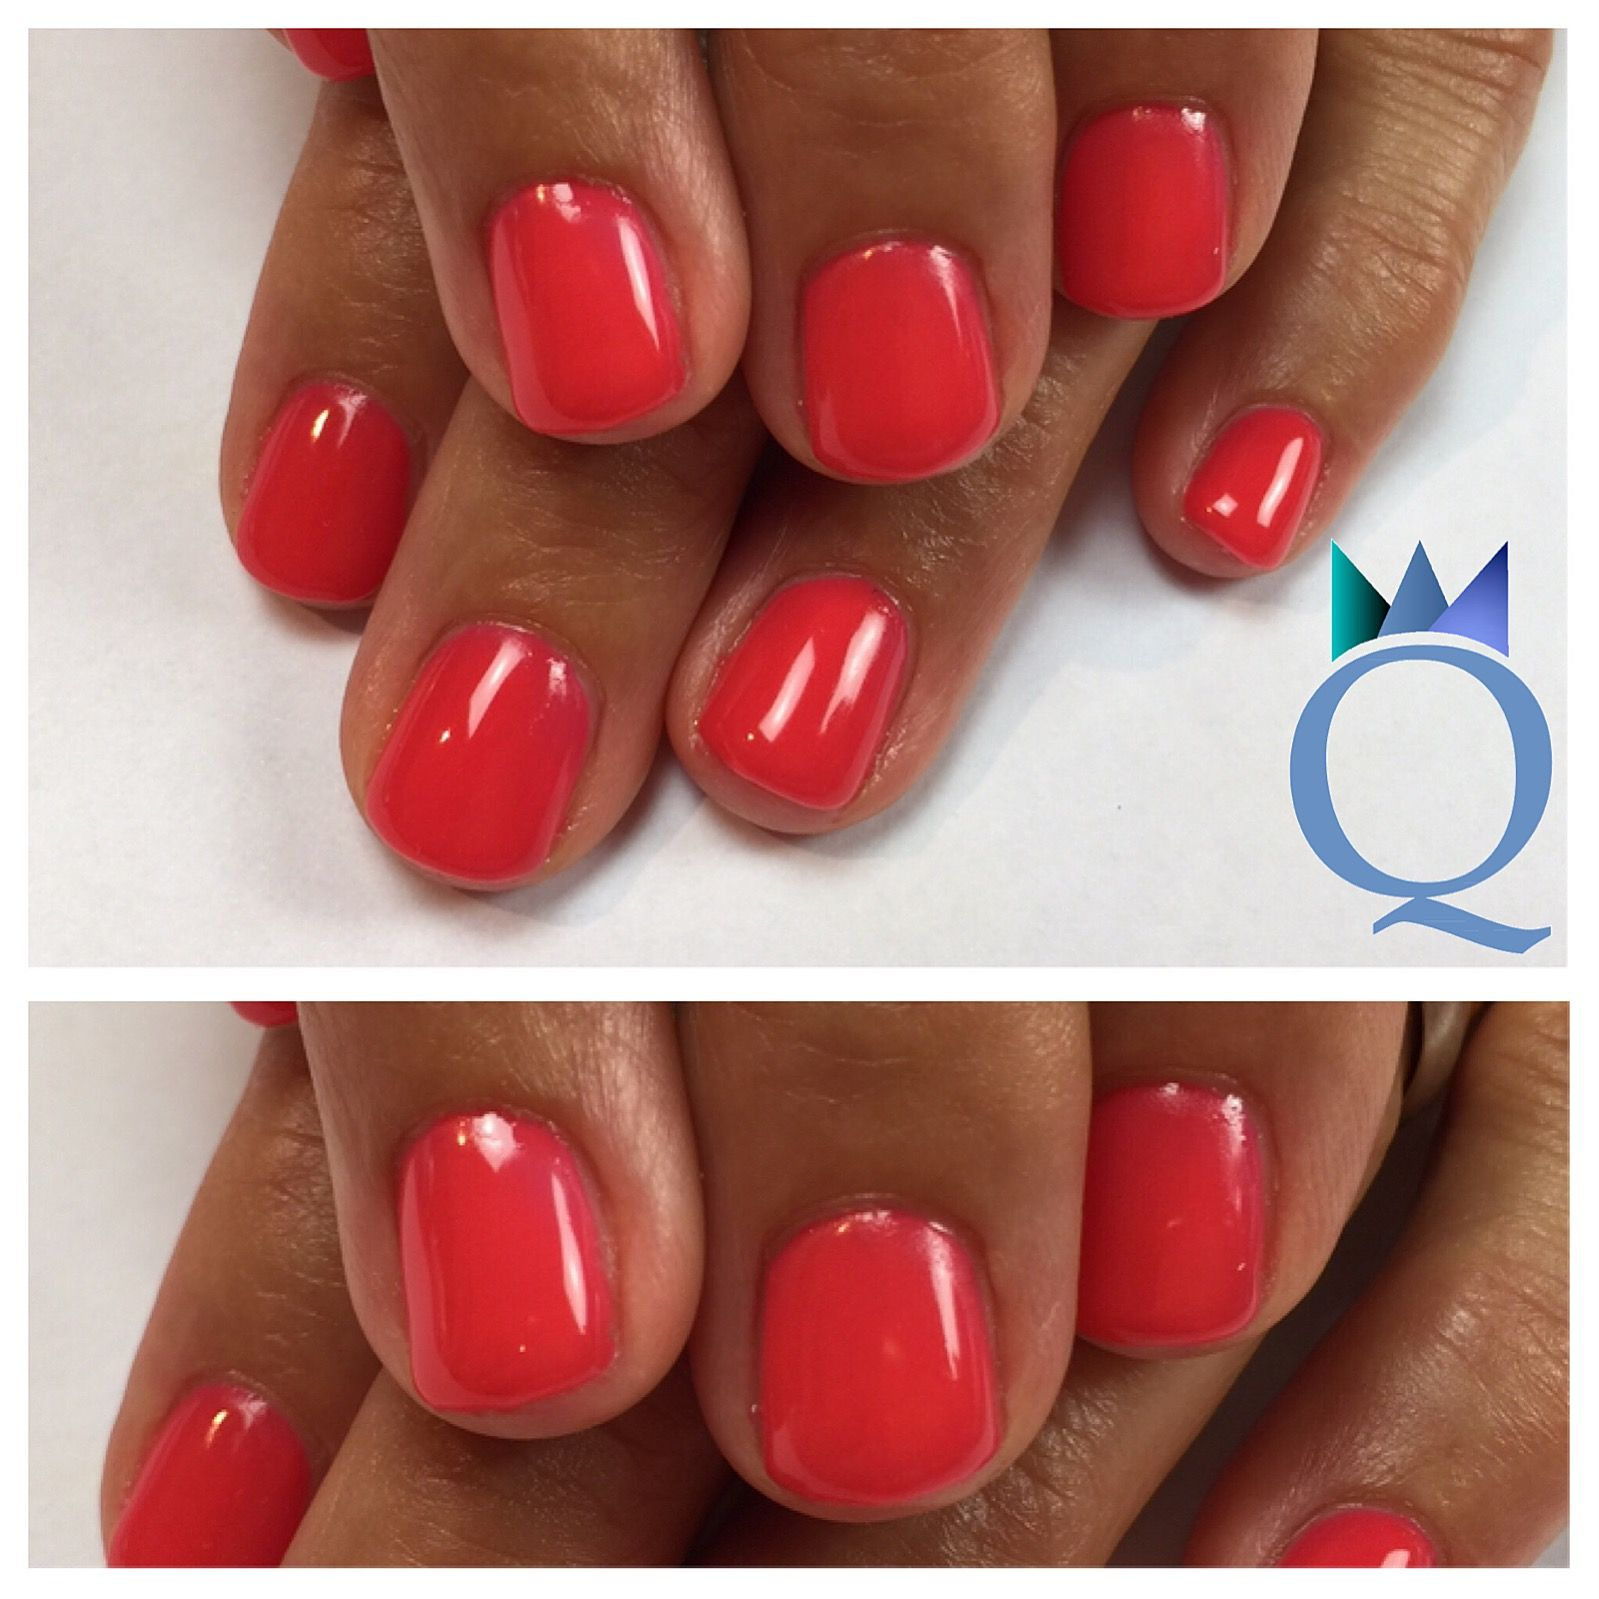 shortnails #gelnails #nails #coral #kurzenägel #gelnägel #nägel ...